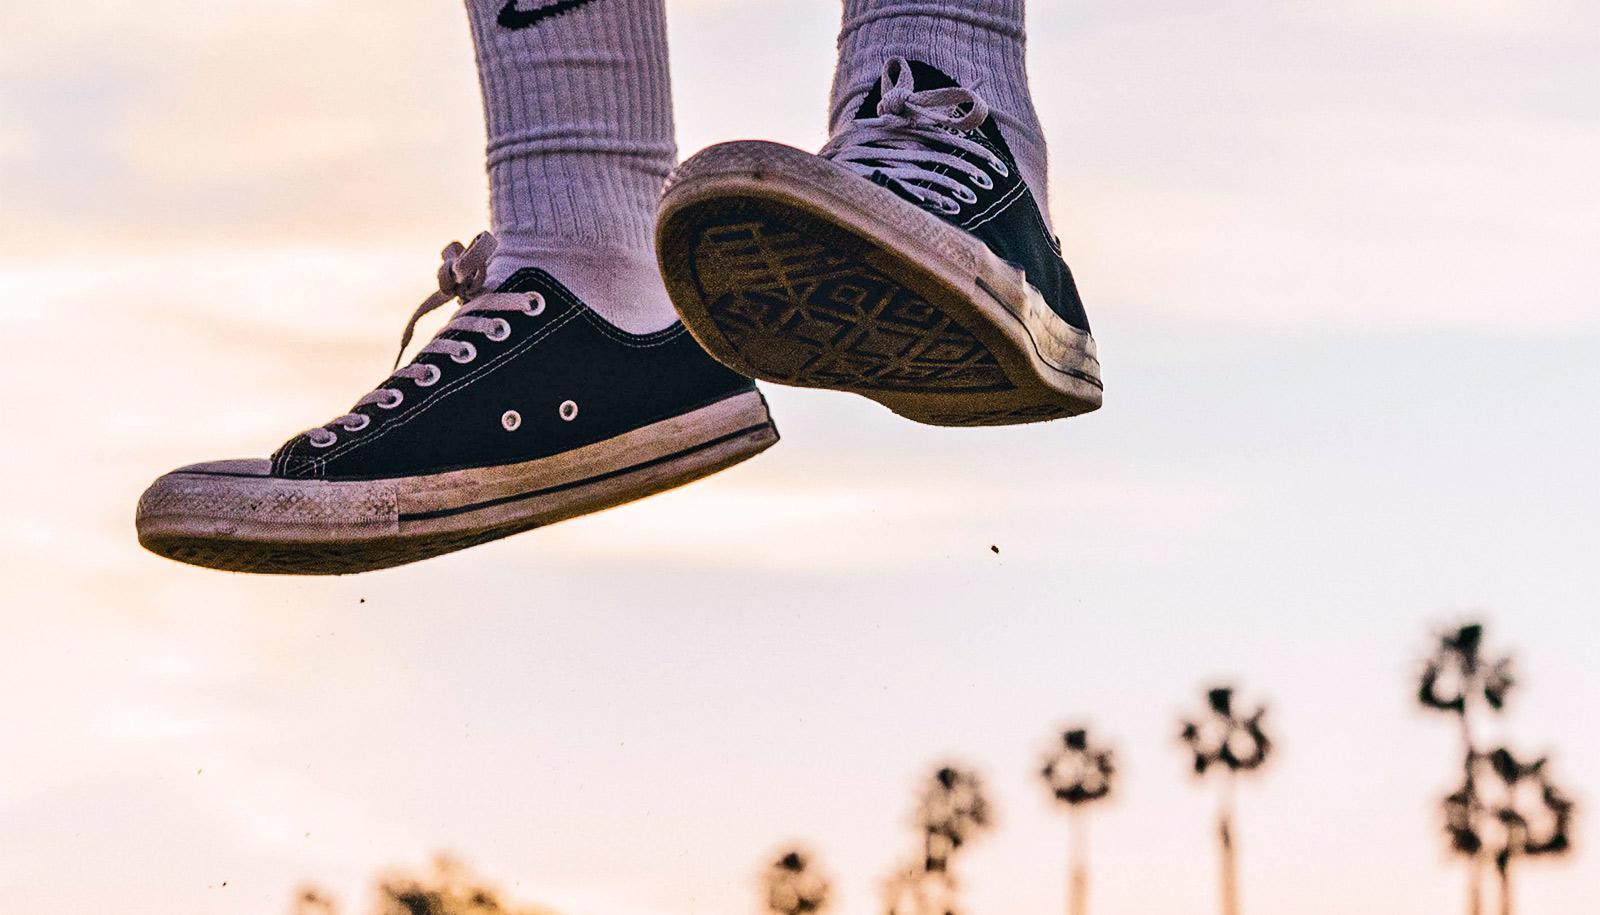 converse shoes jump (jumping genes concept)